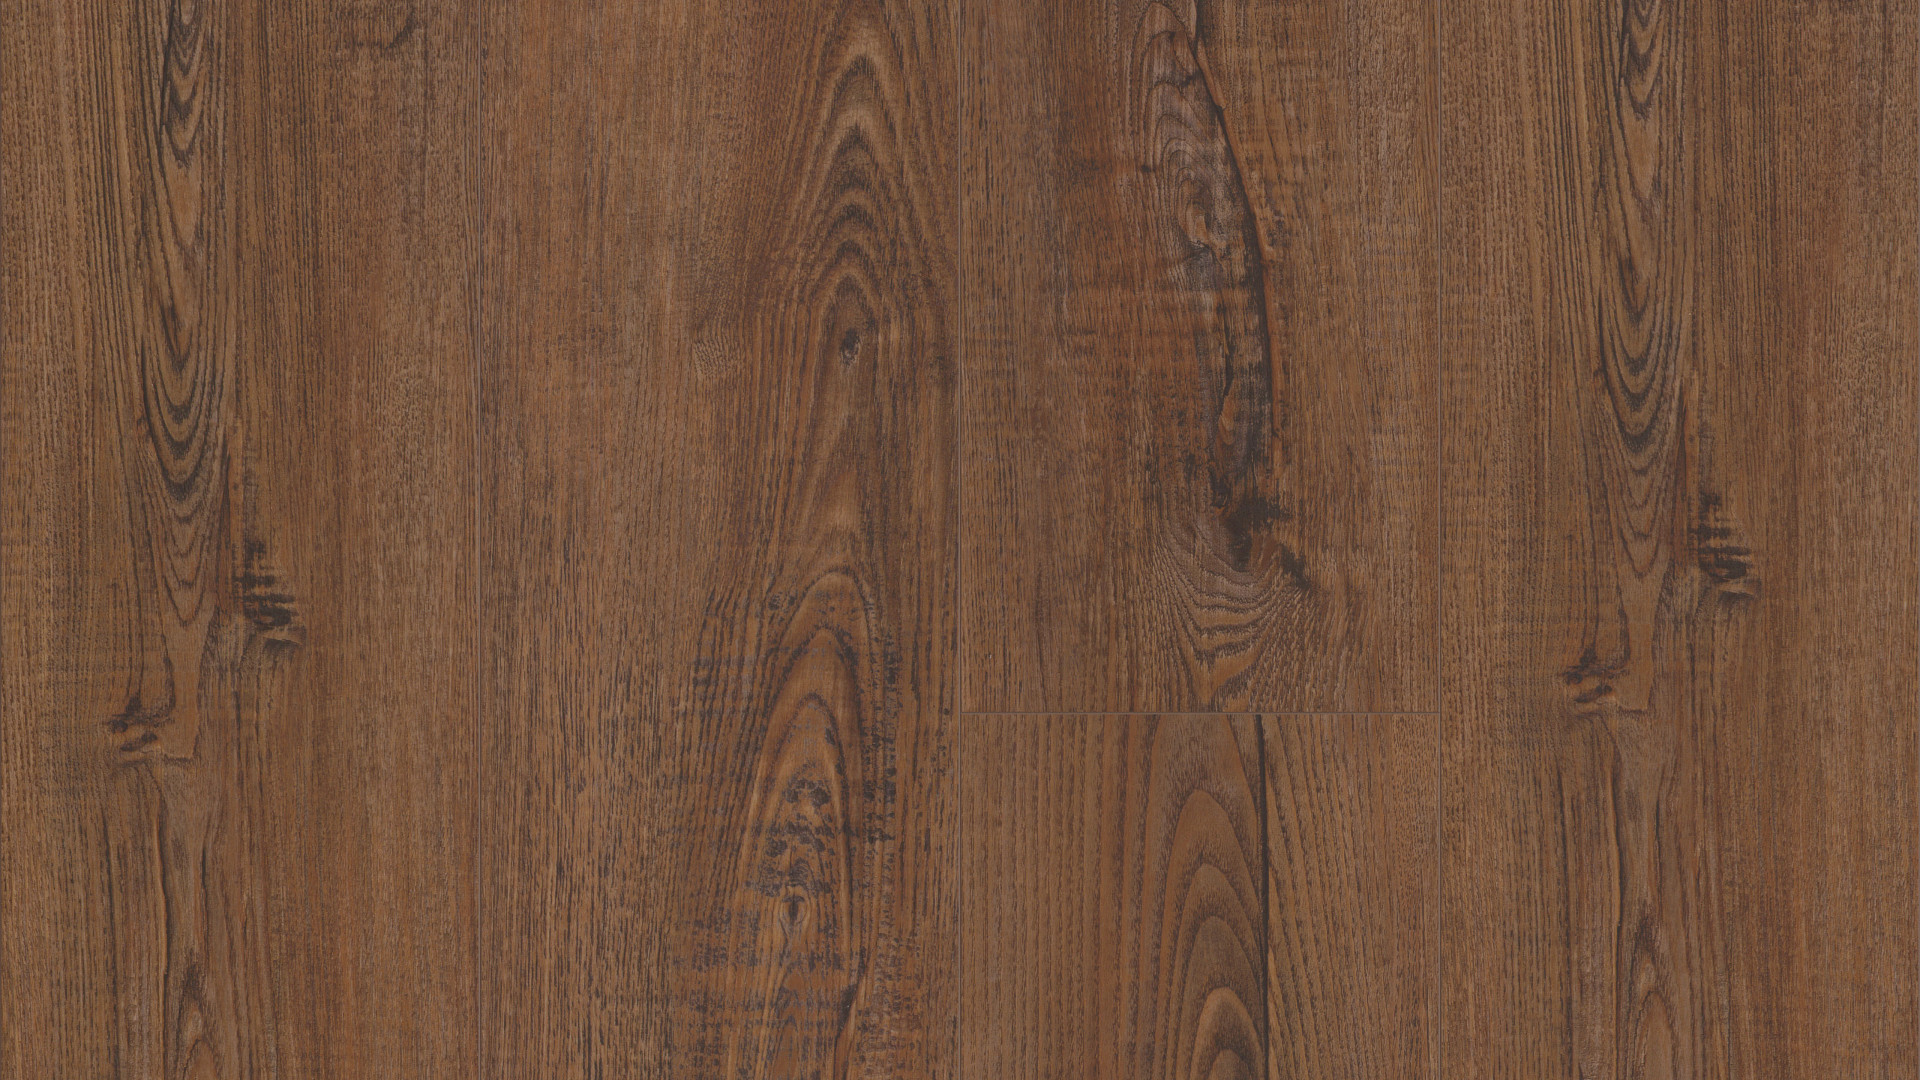 Coretec Plus Hd Barnwood Rustic Pine Vv031 00645 Vinyl Plank Flooring Coretec